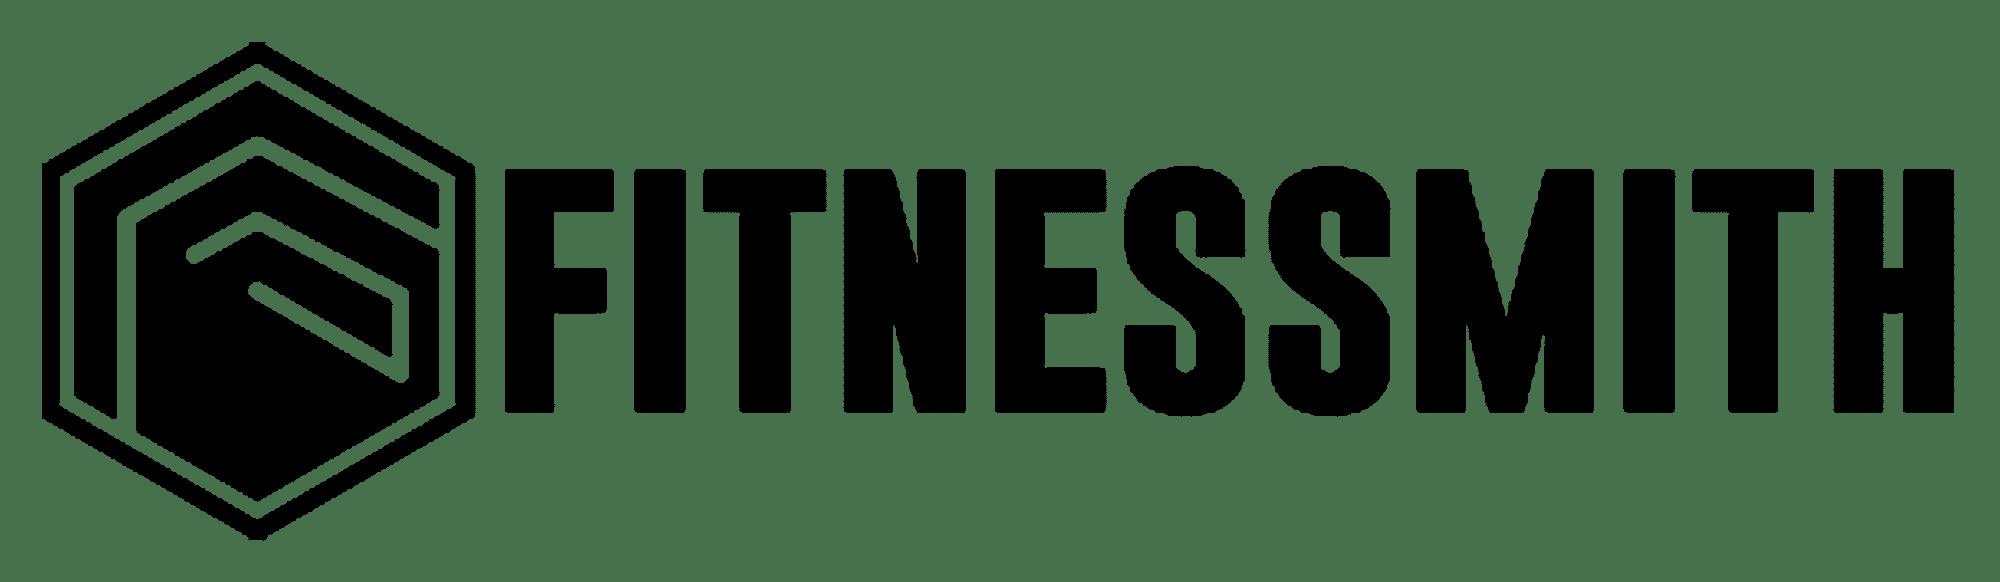 Fitnessmith